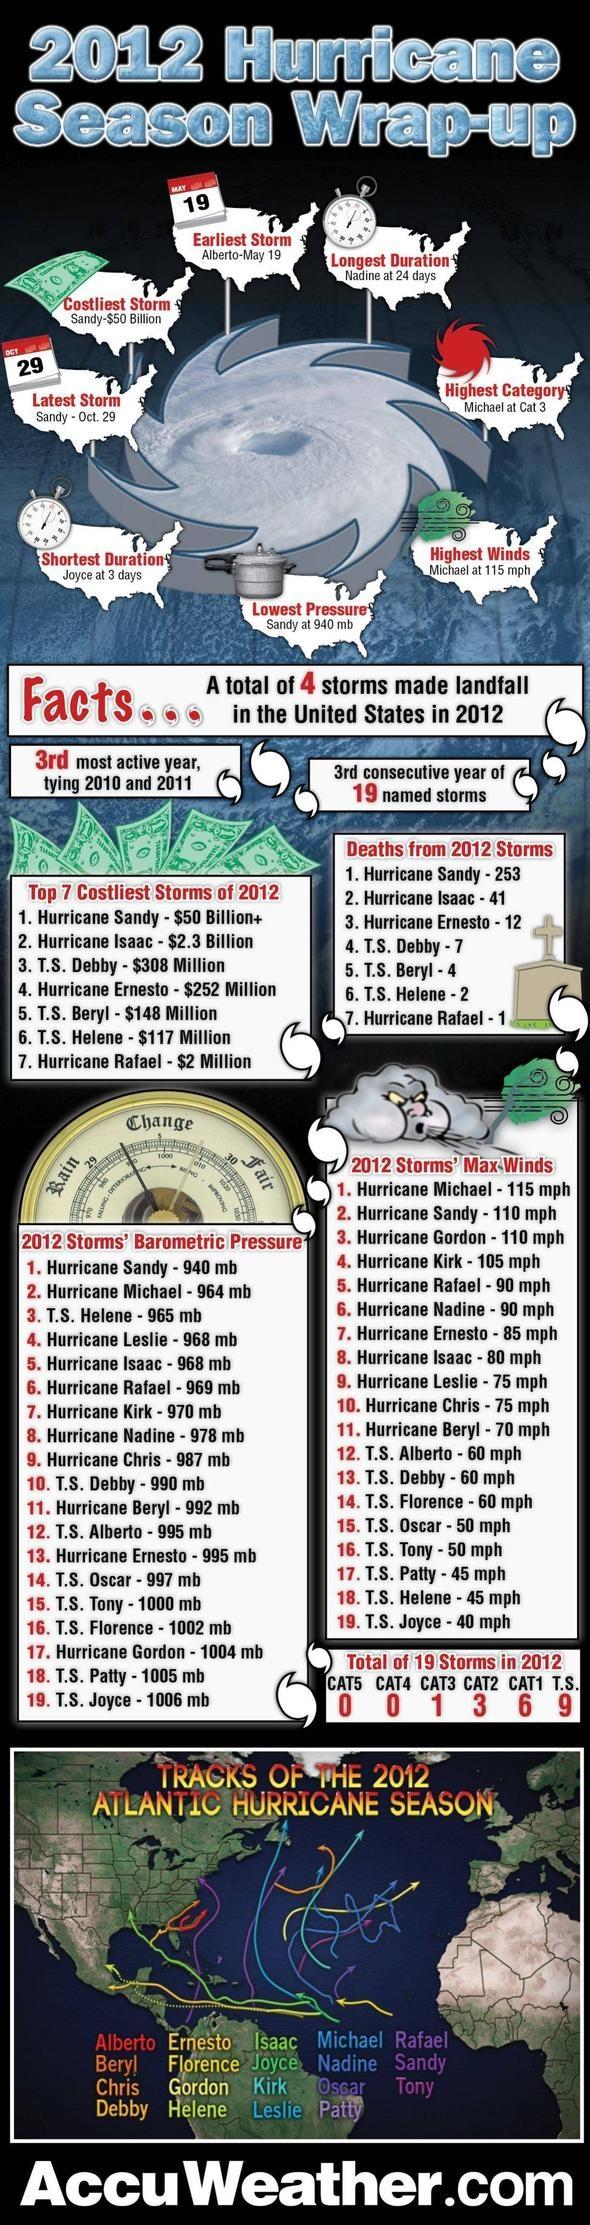 Stats of 2012 Atlantic Hurrica